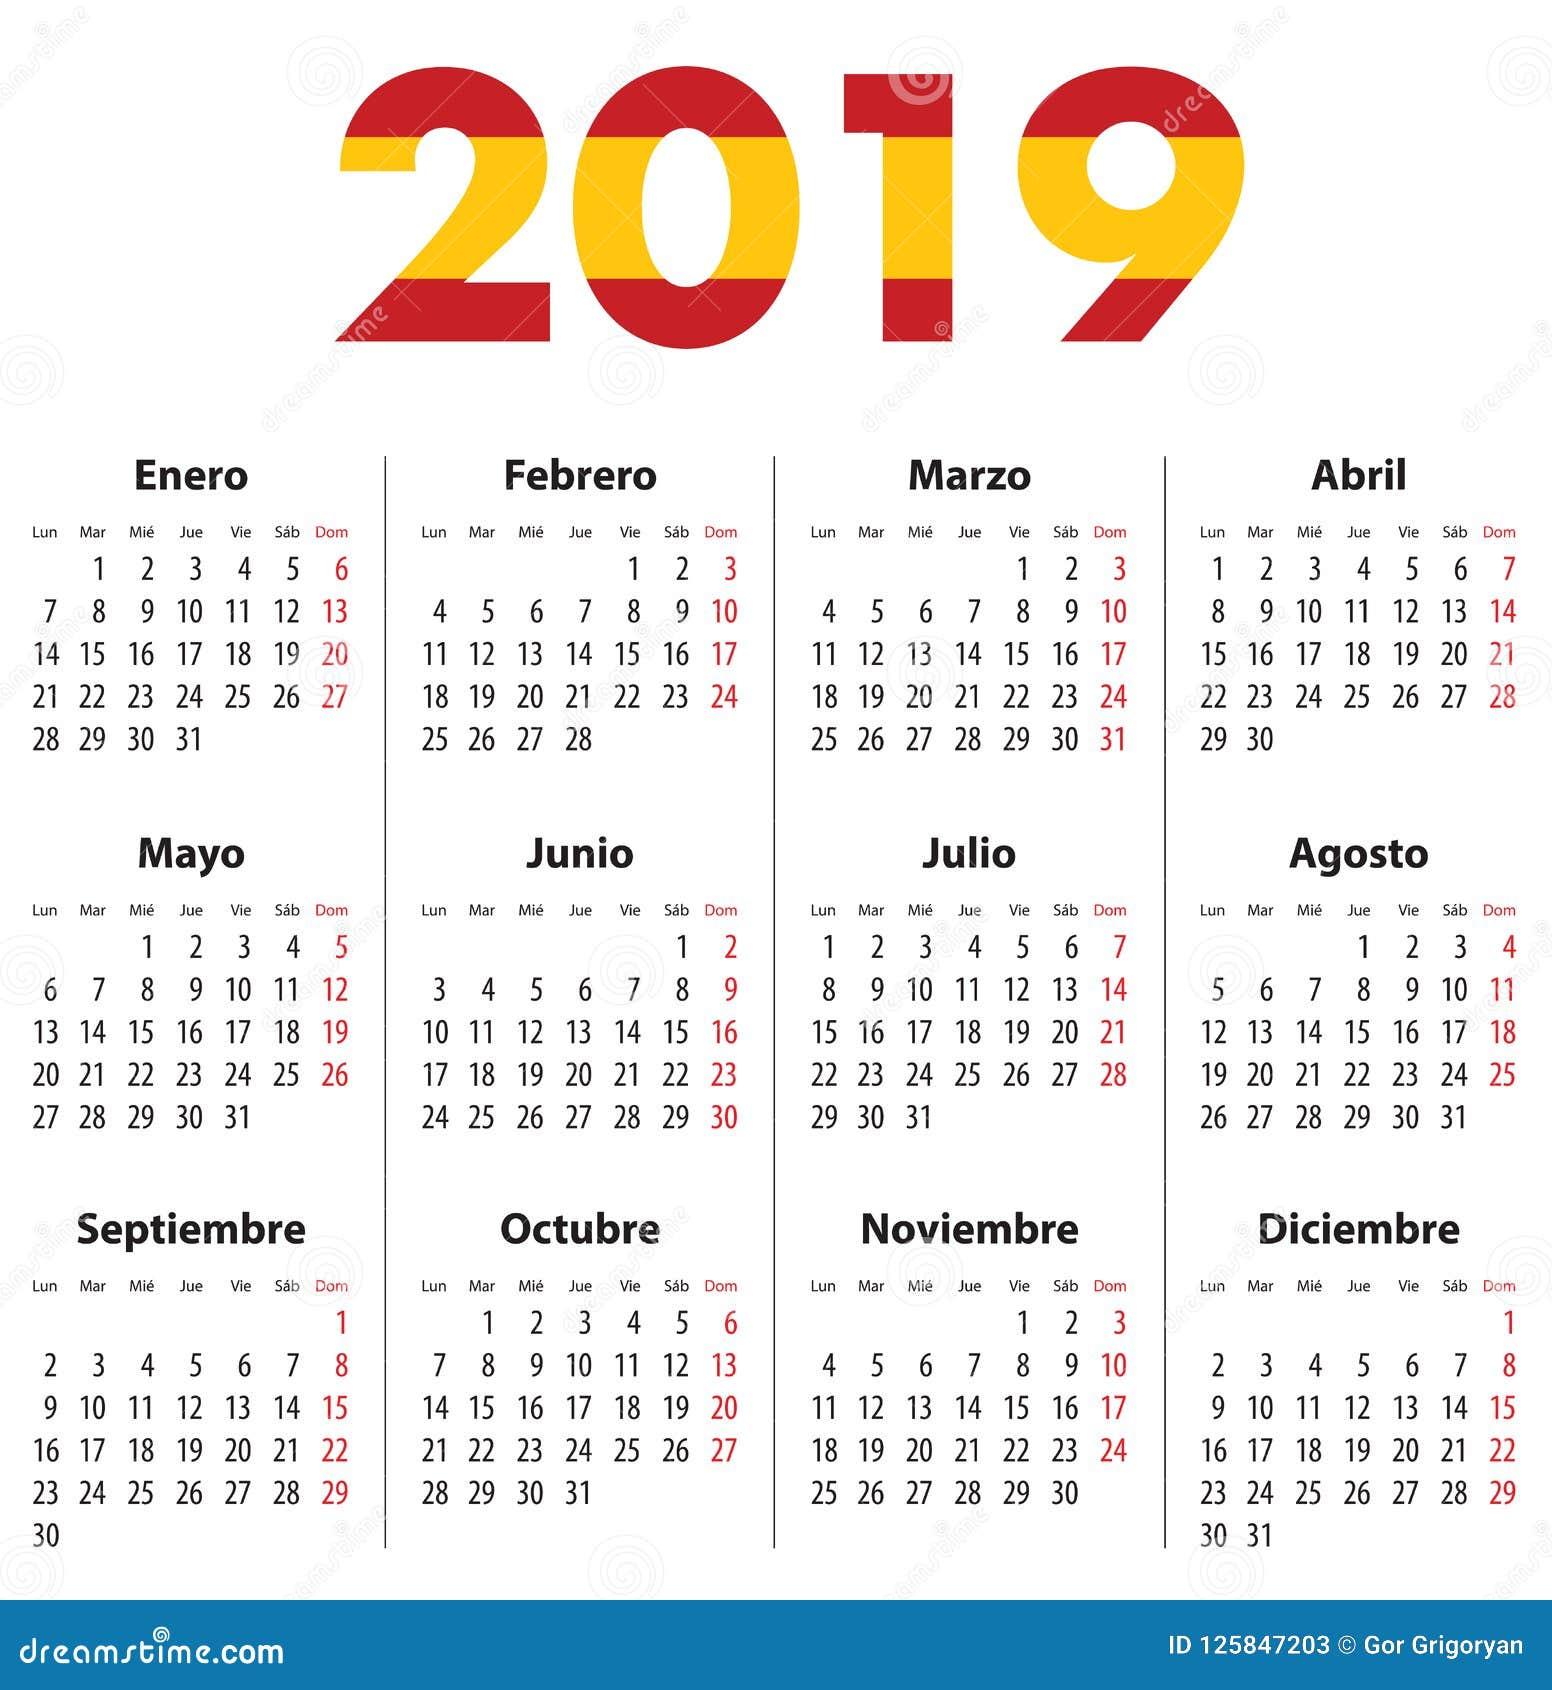 April Calendar In Spanish : April calendar spanish picture pictures printable